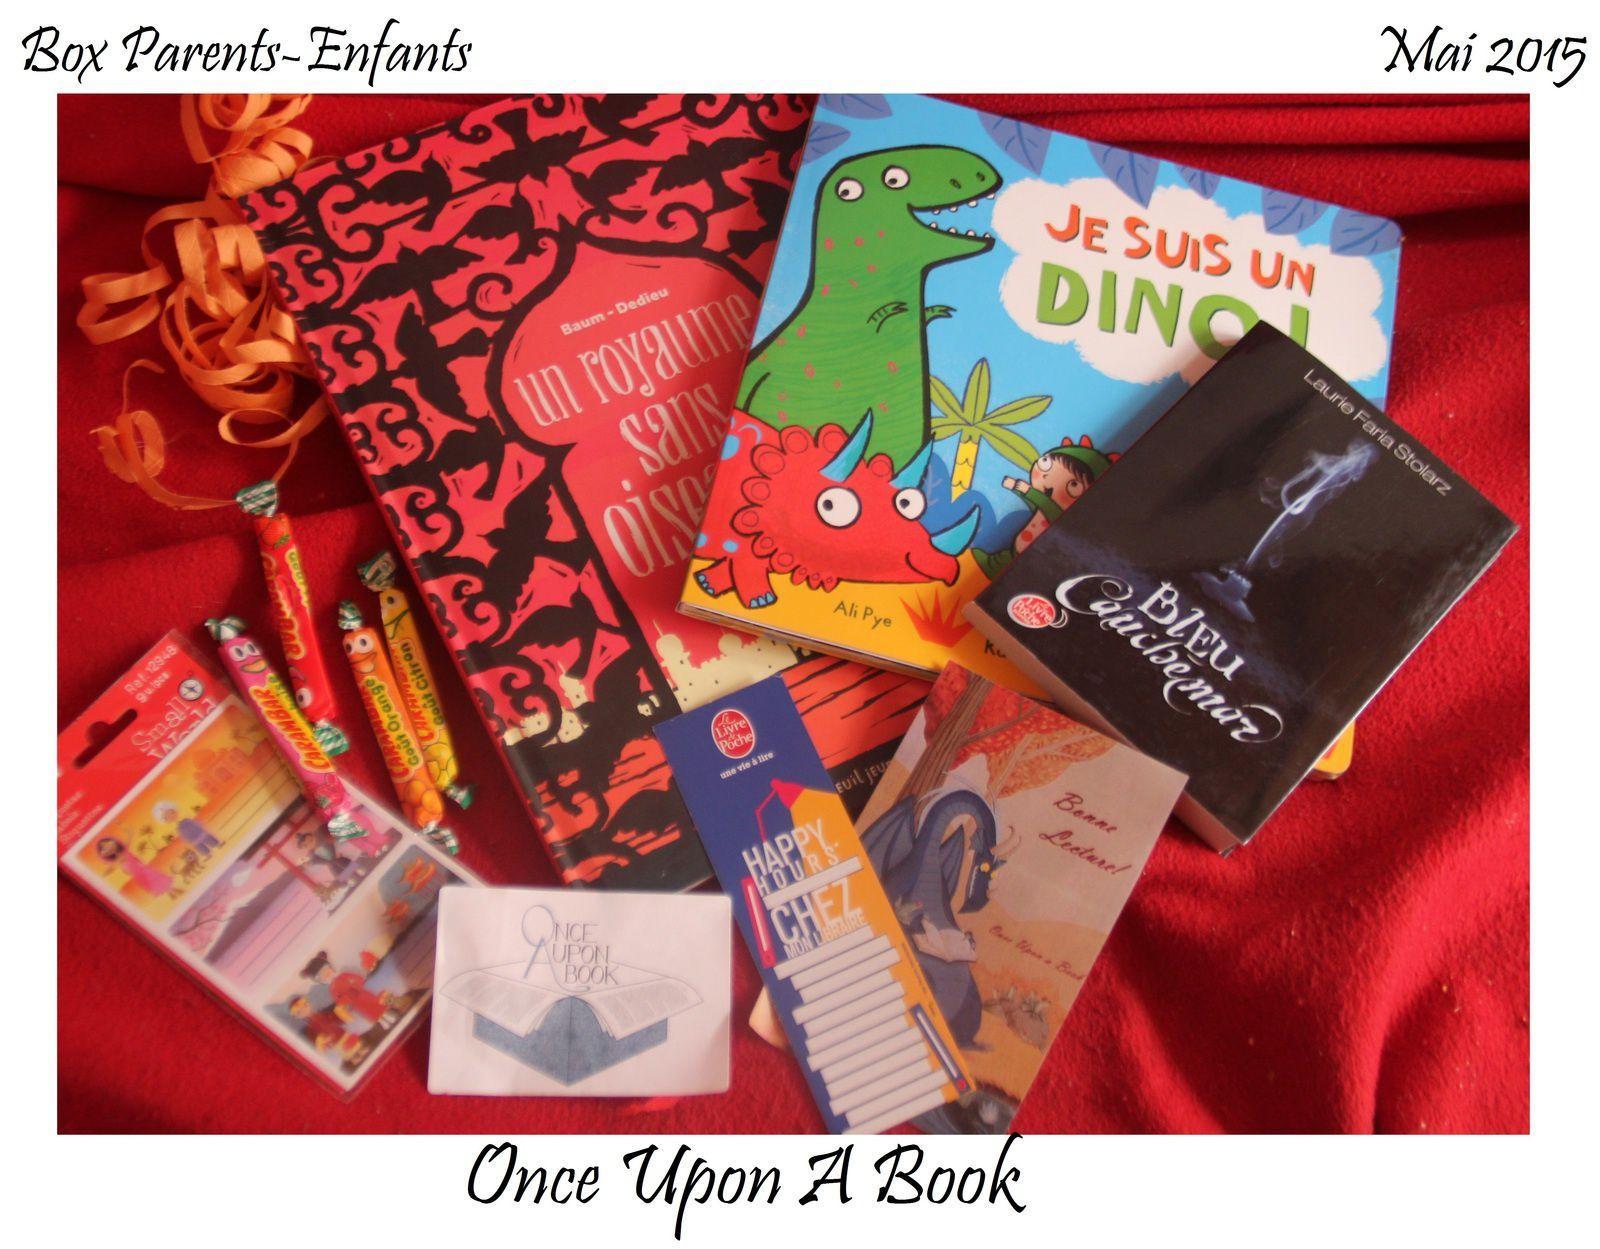 Box n°1 : Once Upon A Book, Box Parents-enfants mai 2015